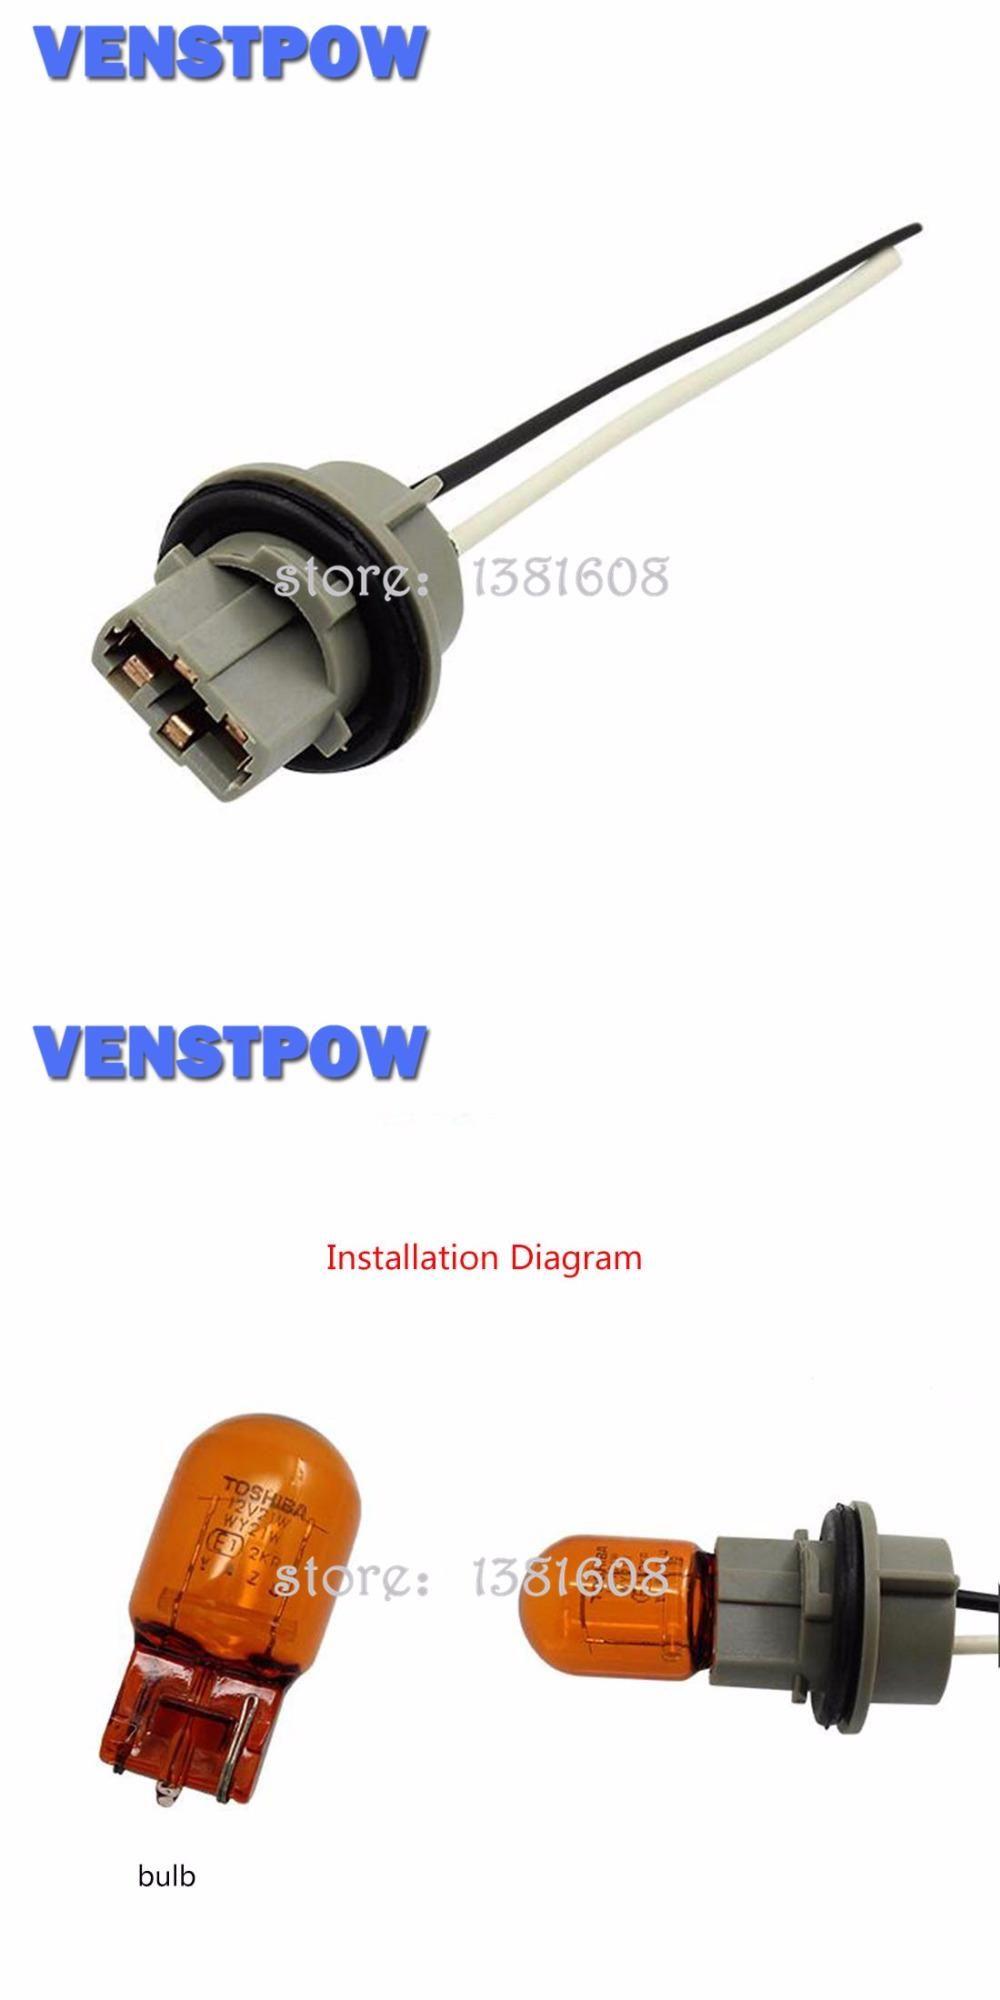 1pc T20 Car Bulb Socket Brake Turn Signal Light Harness Wire Led Pig Tail Plug T20 Lamp Holder Connector Plug Car Bulbs Lamp Holder Bulb